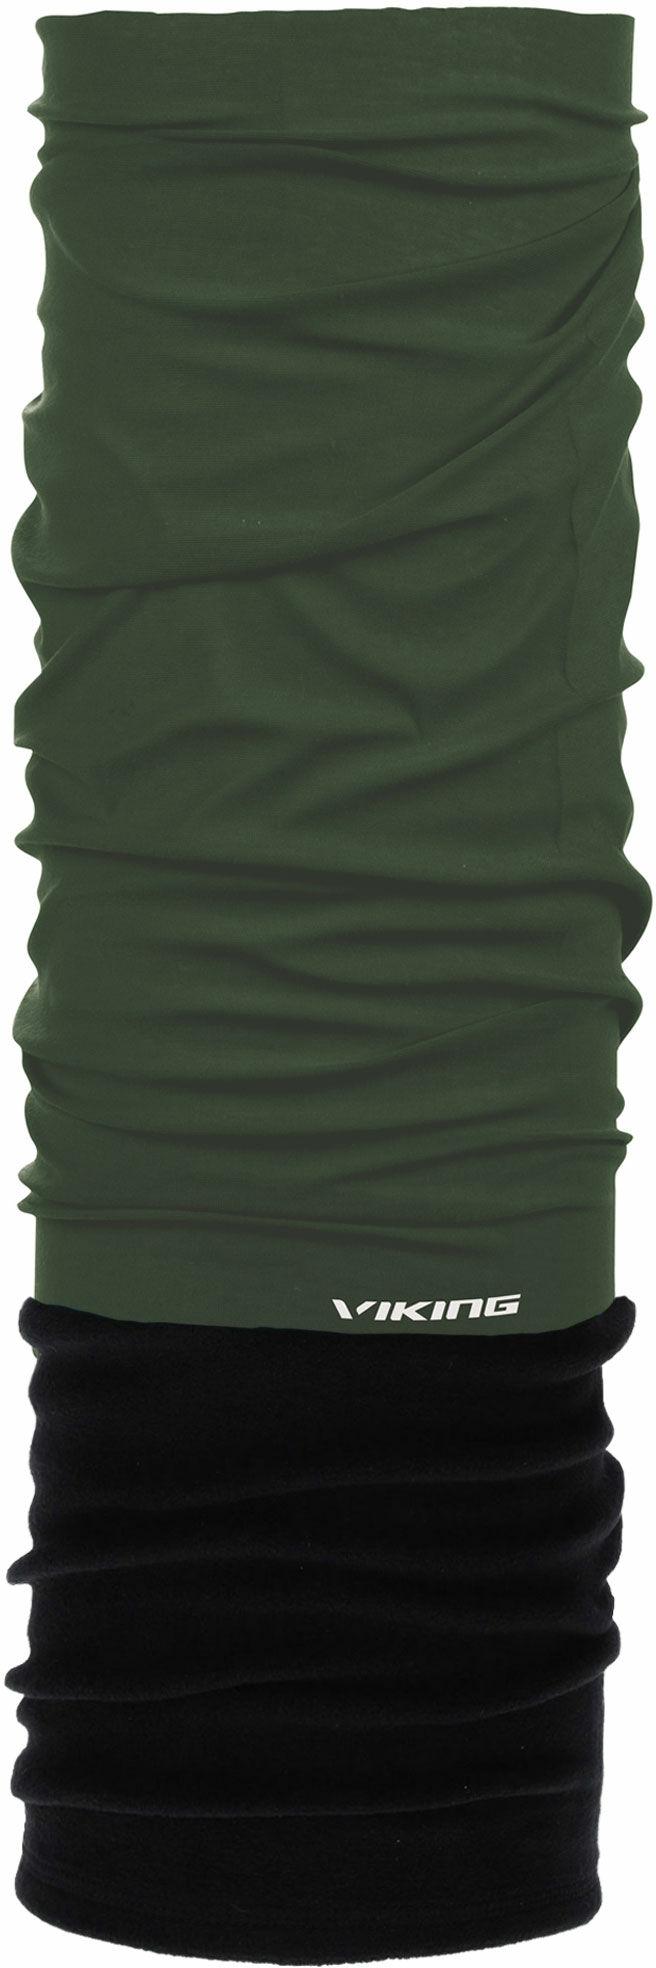 VIKING bandana wielofunkcyjna POLARTEC OUTSIDE dark green 420/22/1214/74 Rozmiar: UNI,420/22/1214/74/UNI